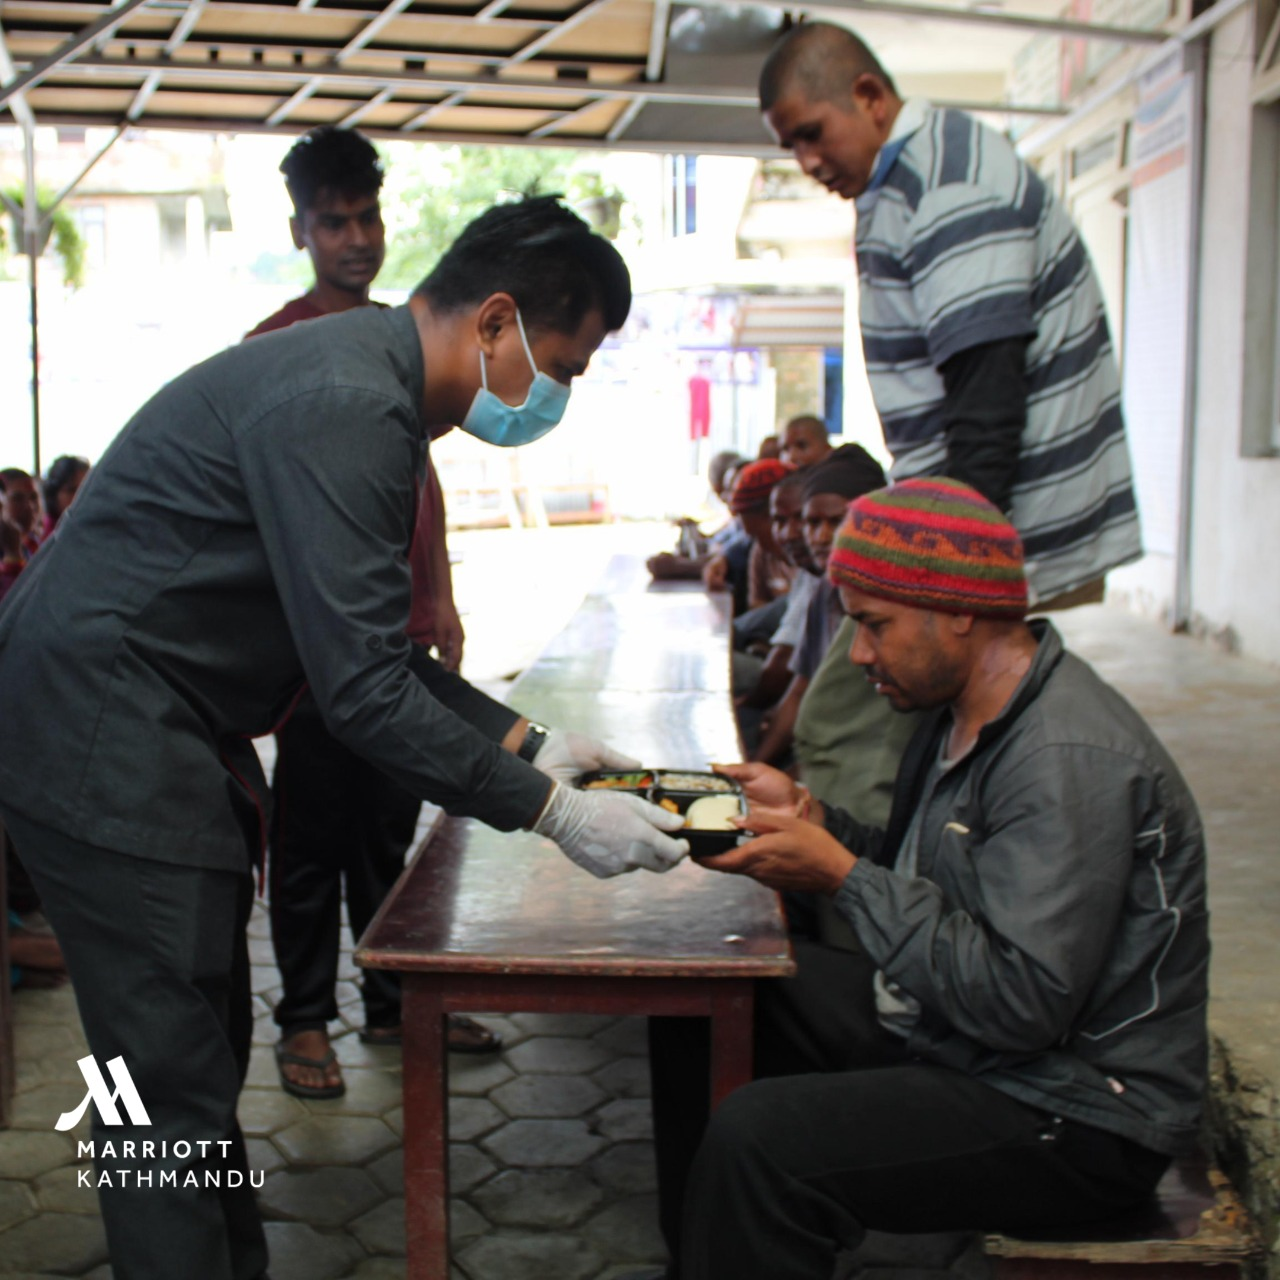 Embassy of Israel in Nepal in cooperation with Kathmandu Marriott Hotel delivers food to Manav Kalyan Samaj. Photo Courtesy: Embassy of Israel in Nepal